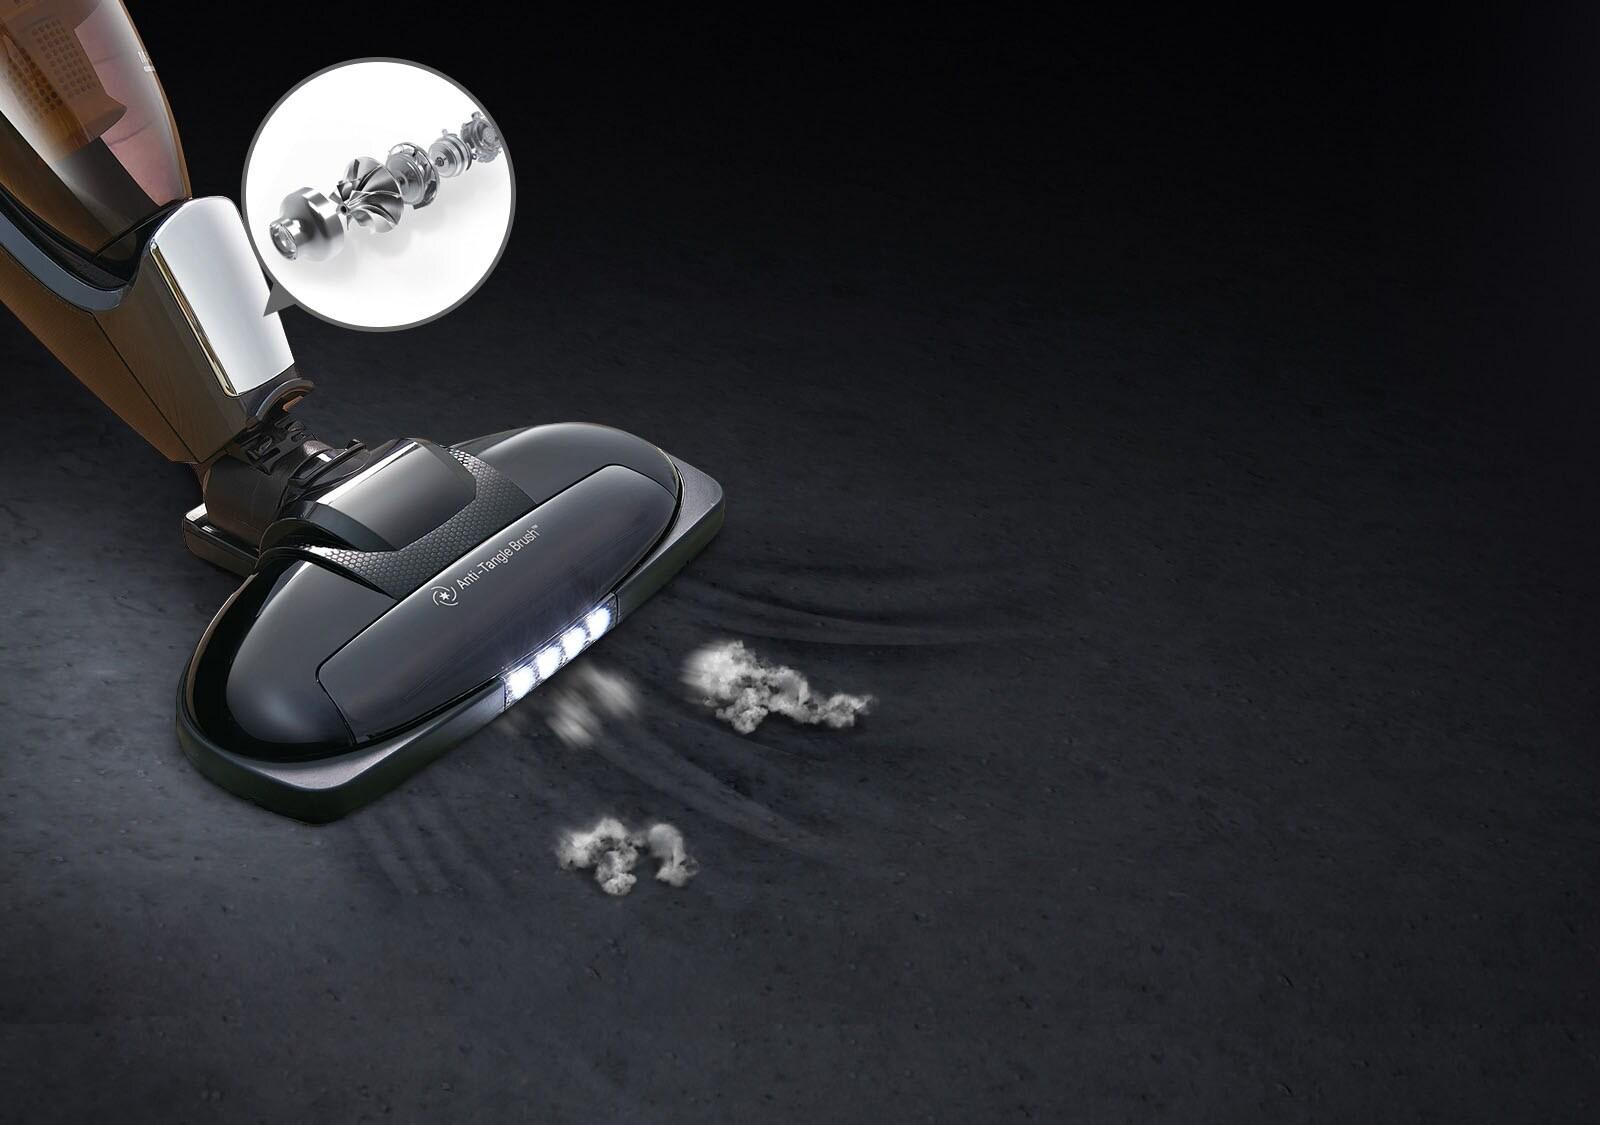 Smart-Inverter-Motor-M022A-revisedd